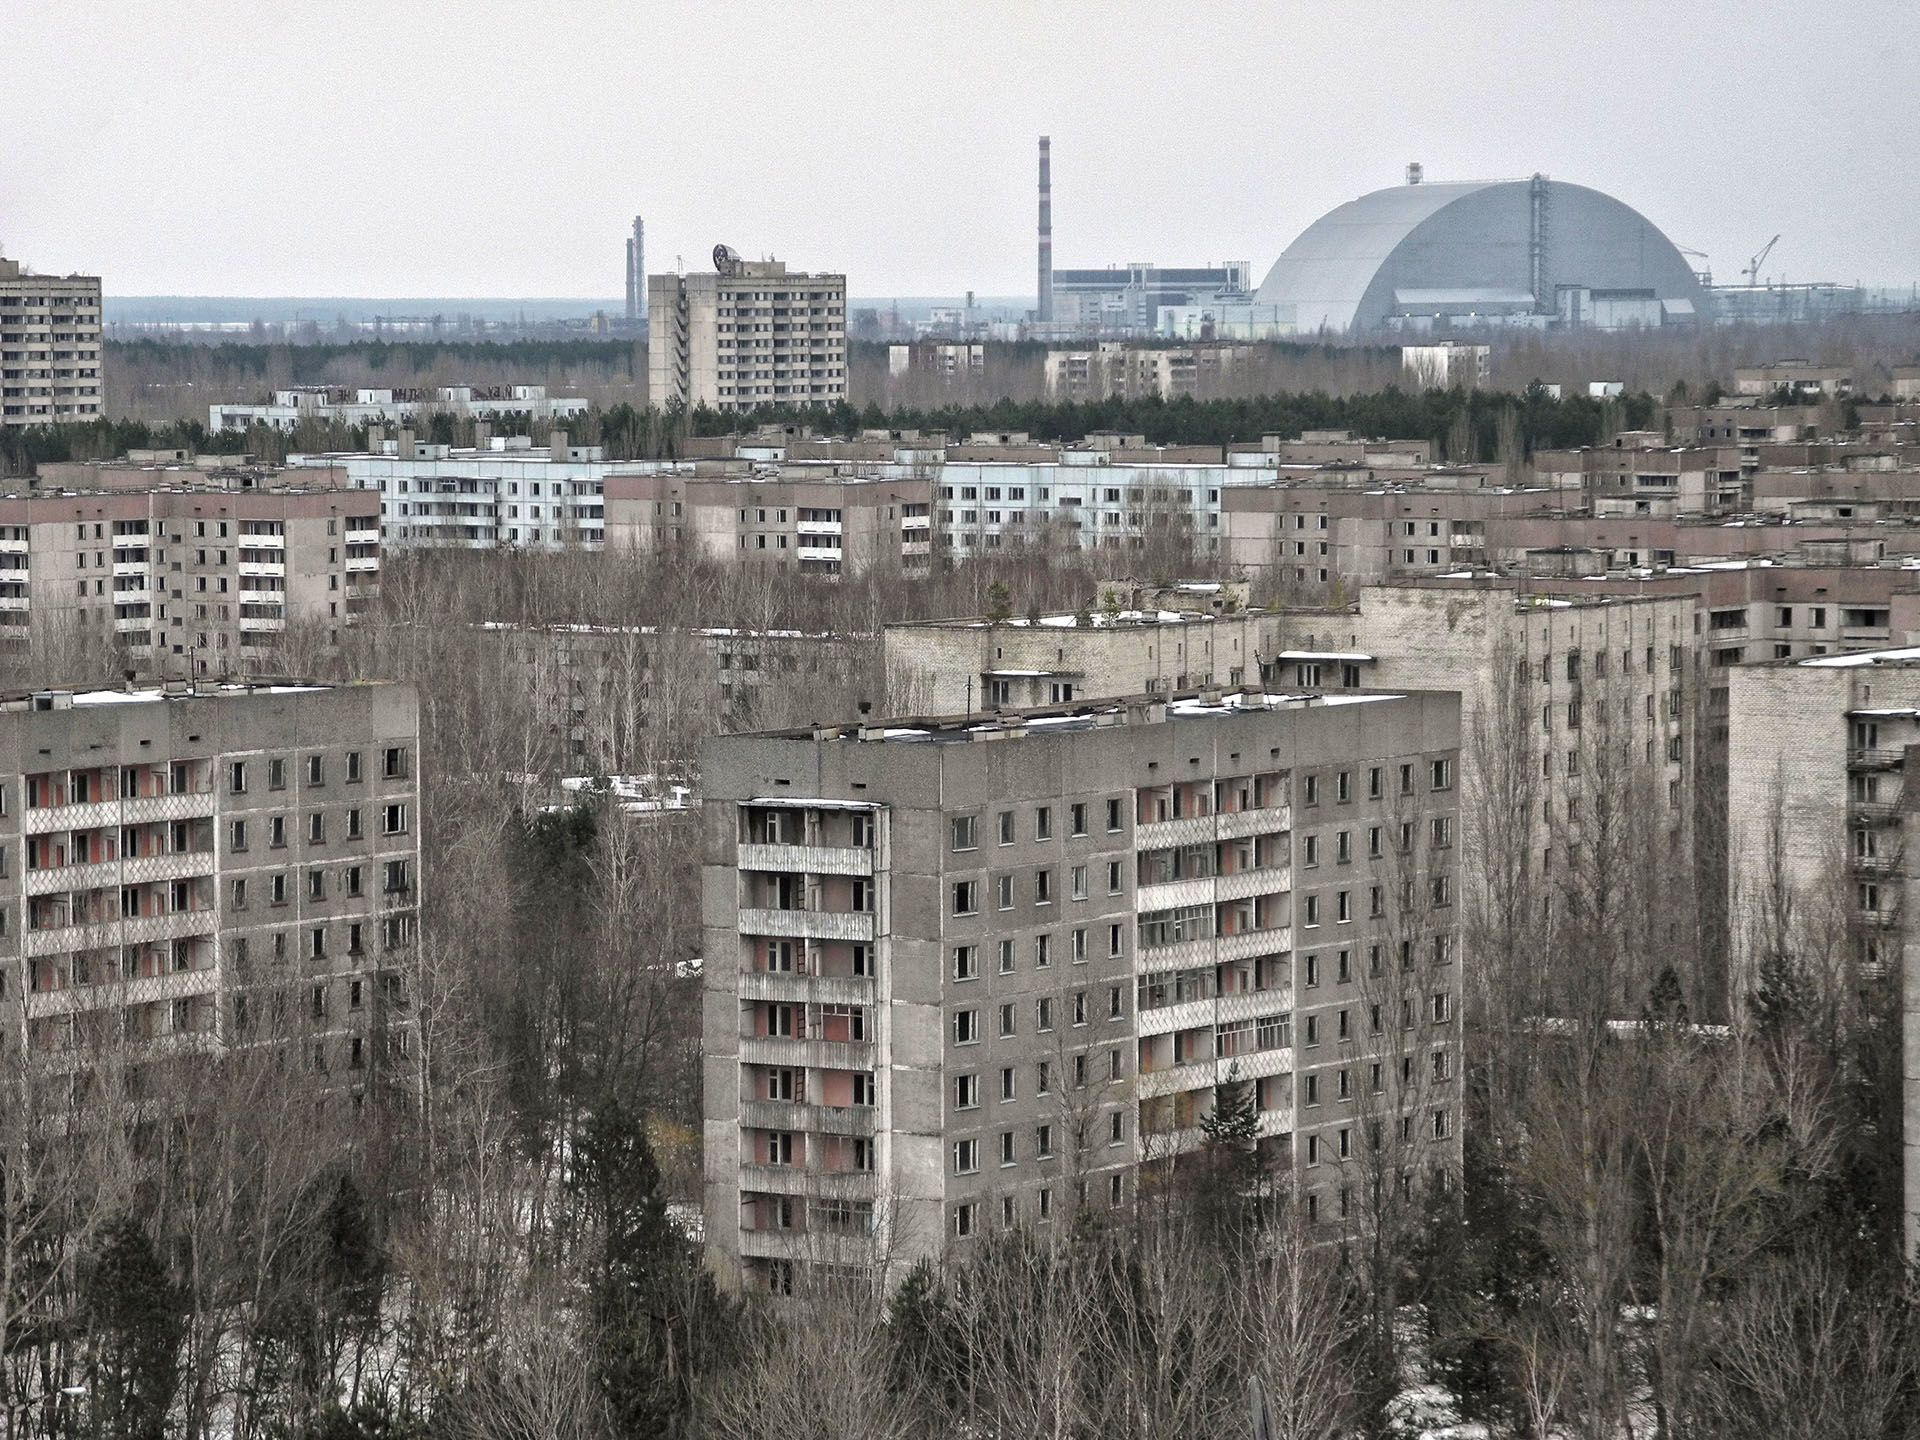 galeria 34 aniversario chernobyl